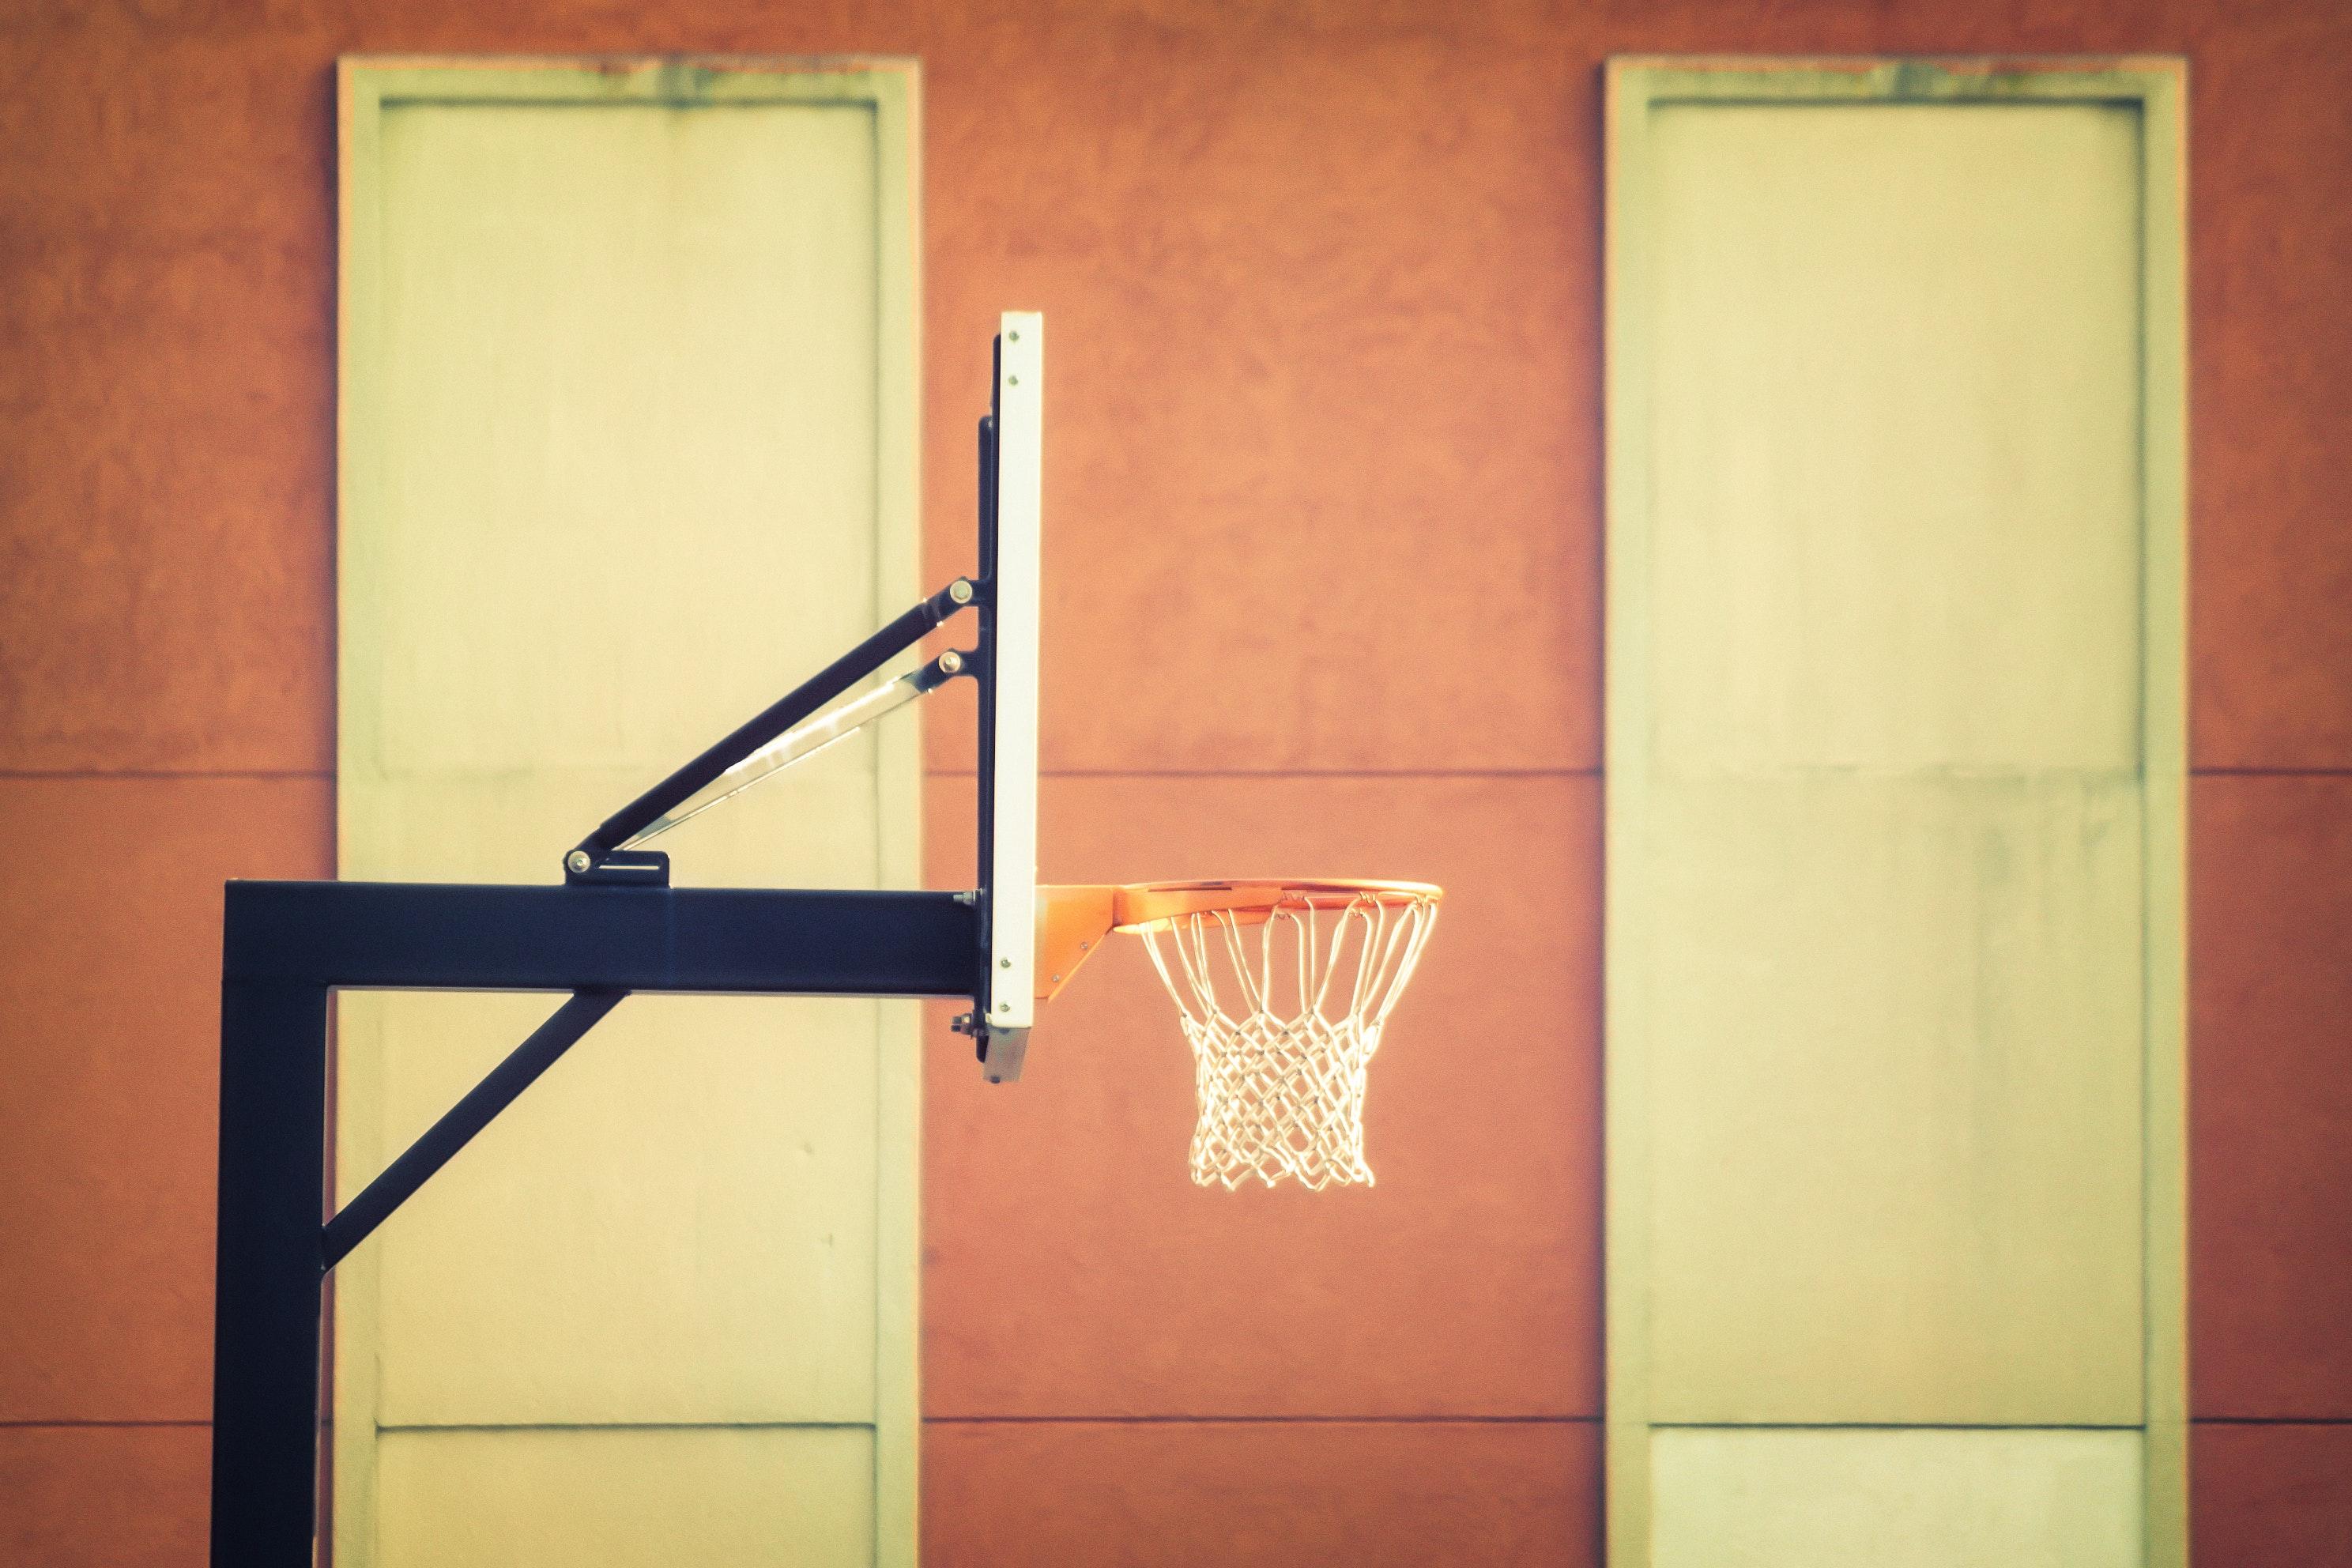 Shallow focus photography of black metal outdoor basketball hoop